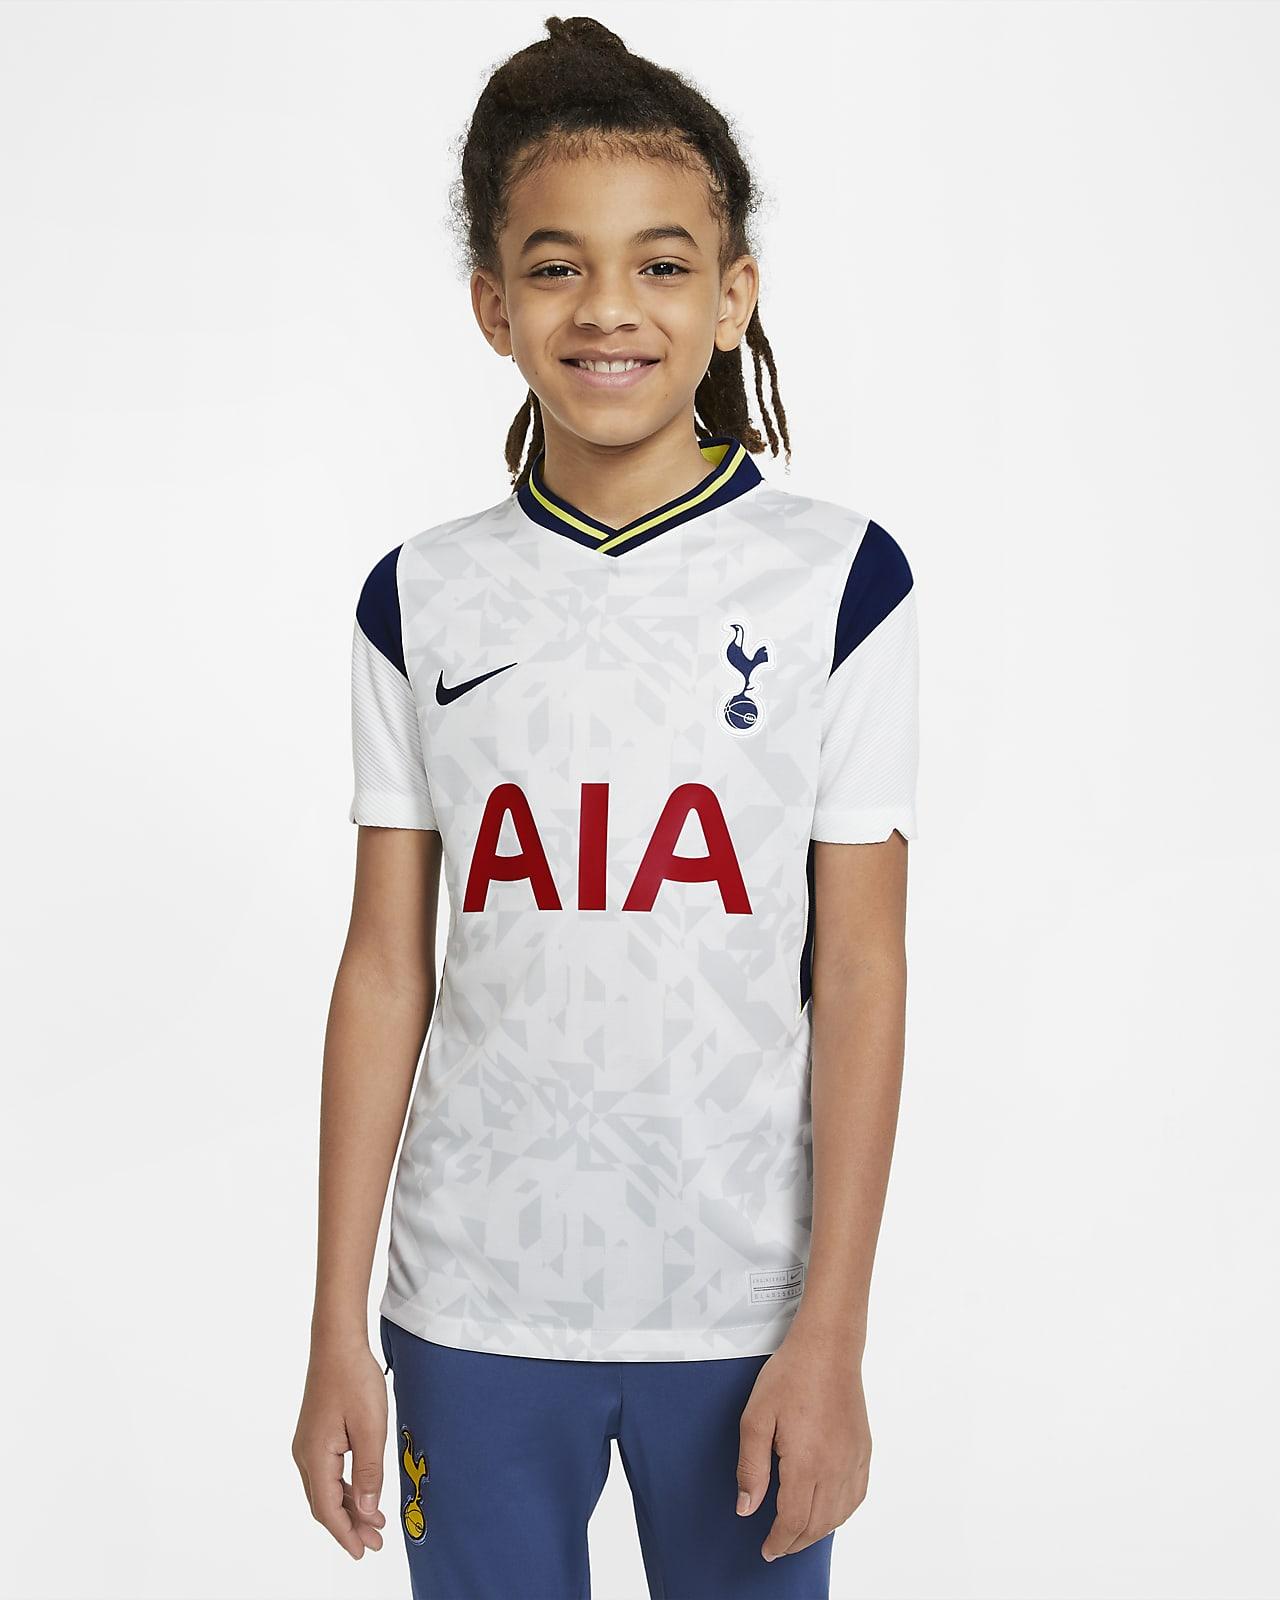 Camiseta de fútbol de local para niños talla grande Stadium del Tottenham Hotspur 2020/21